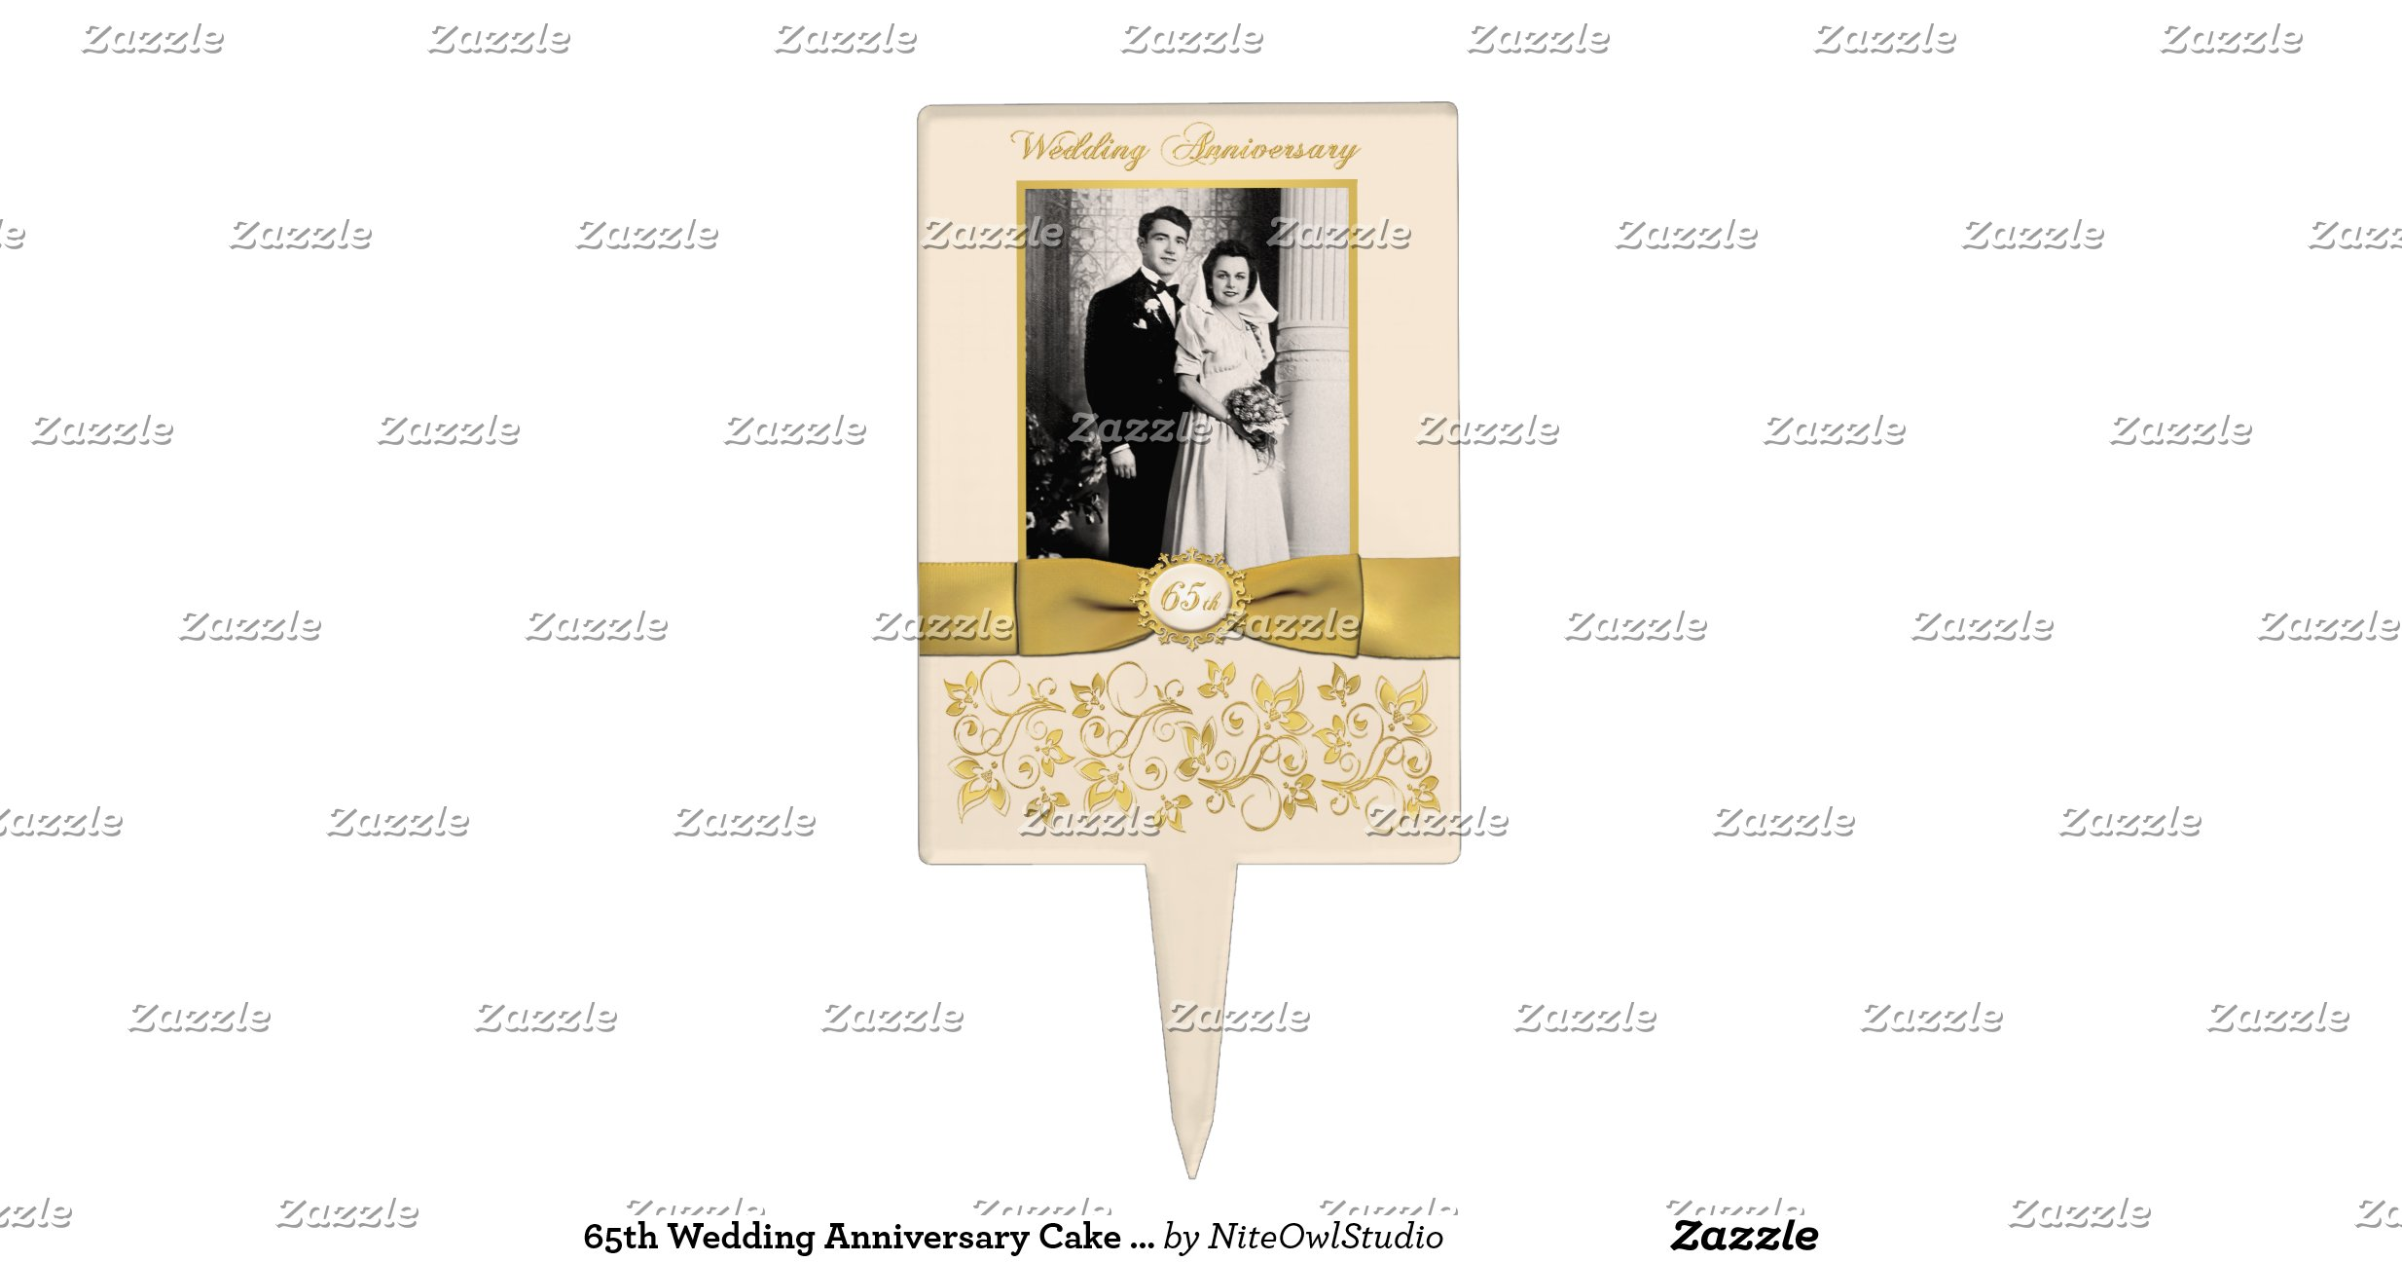 65th Wedding Anniversary Gift Ideas: 65th_wedding_anniversary_cake_pick_with_photo